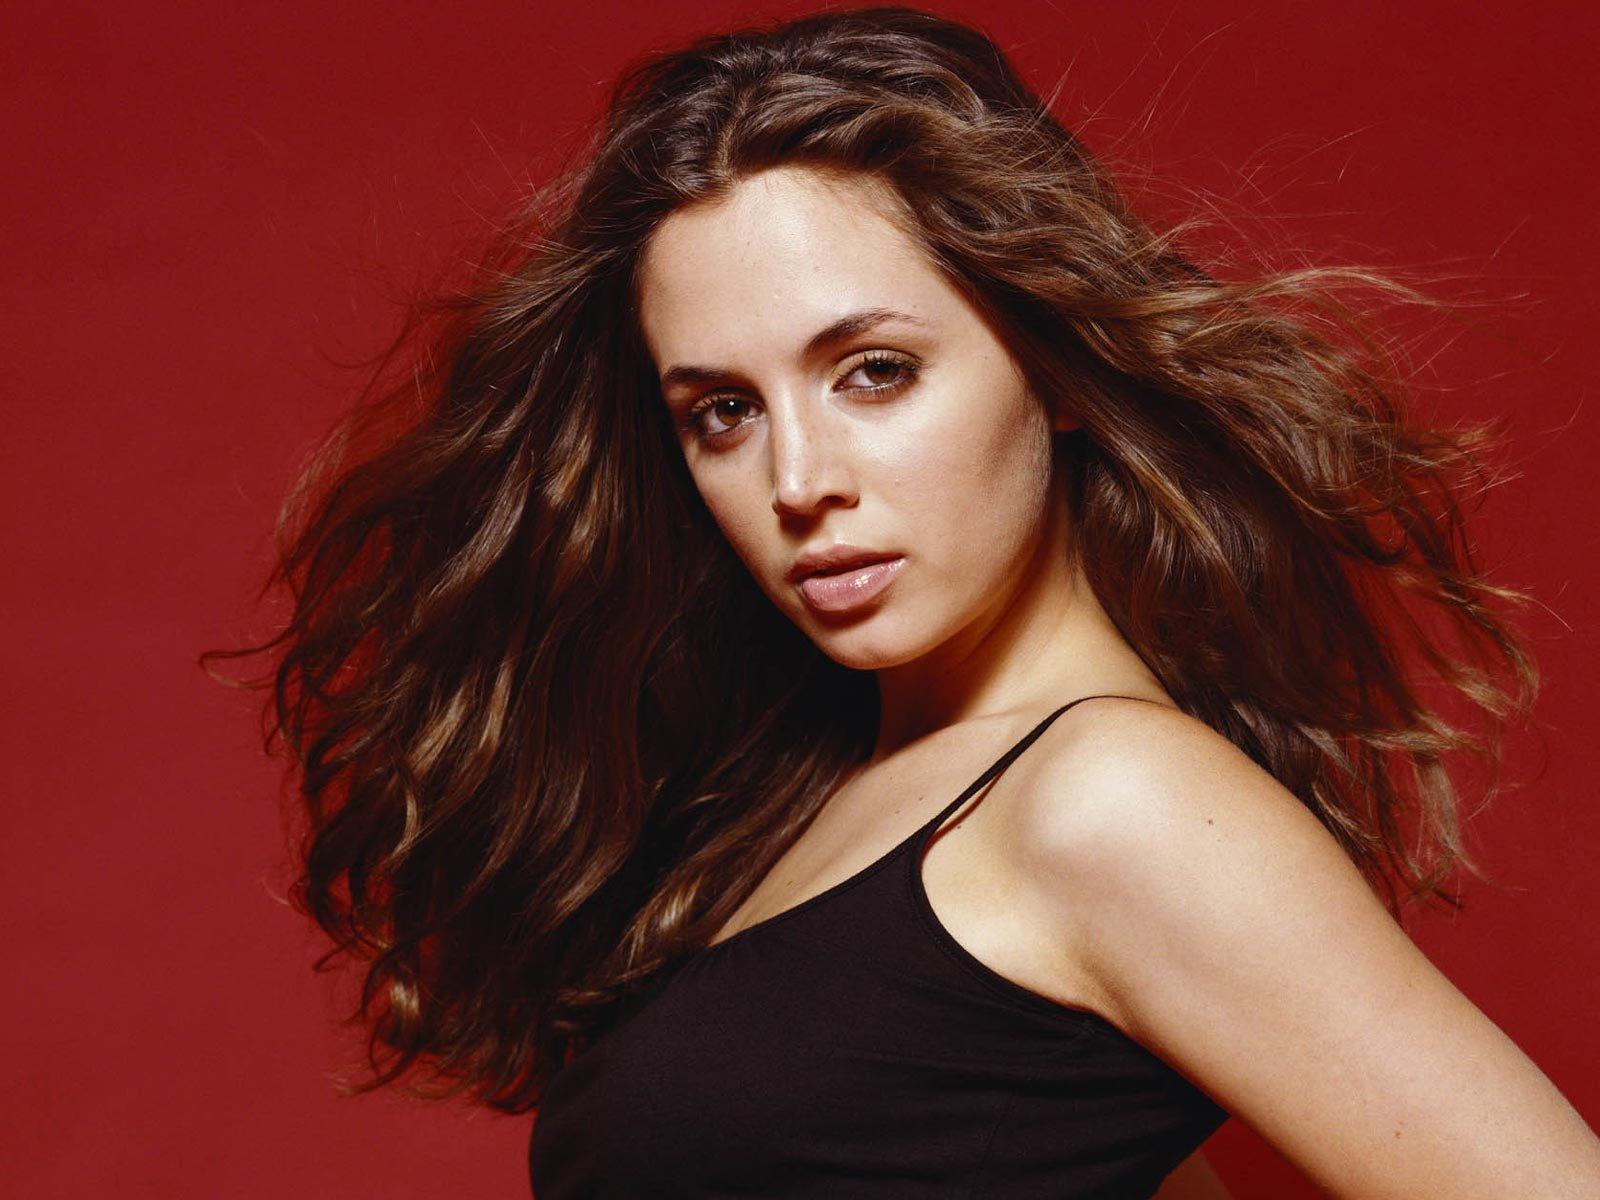 Eliza dushku wallpapers - Celebrity background ...